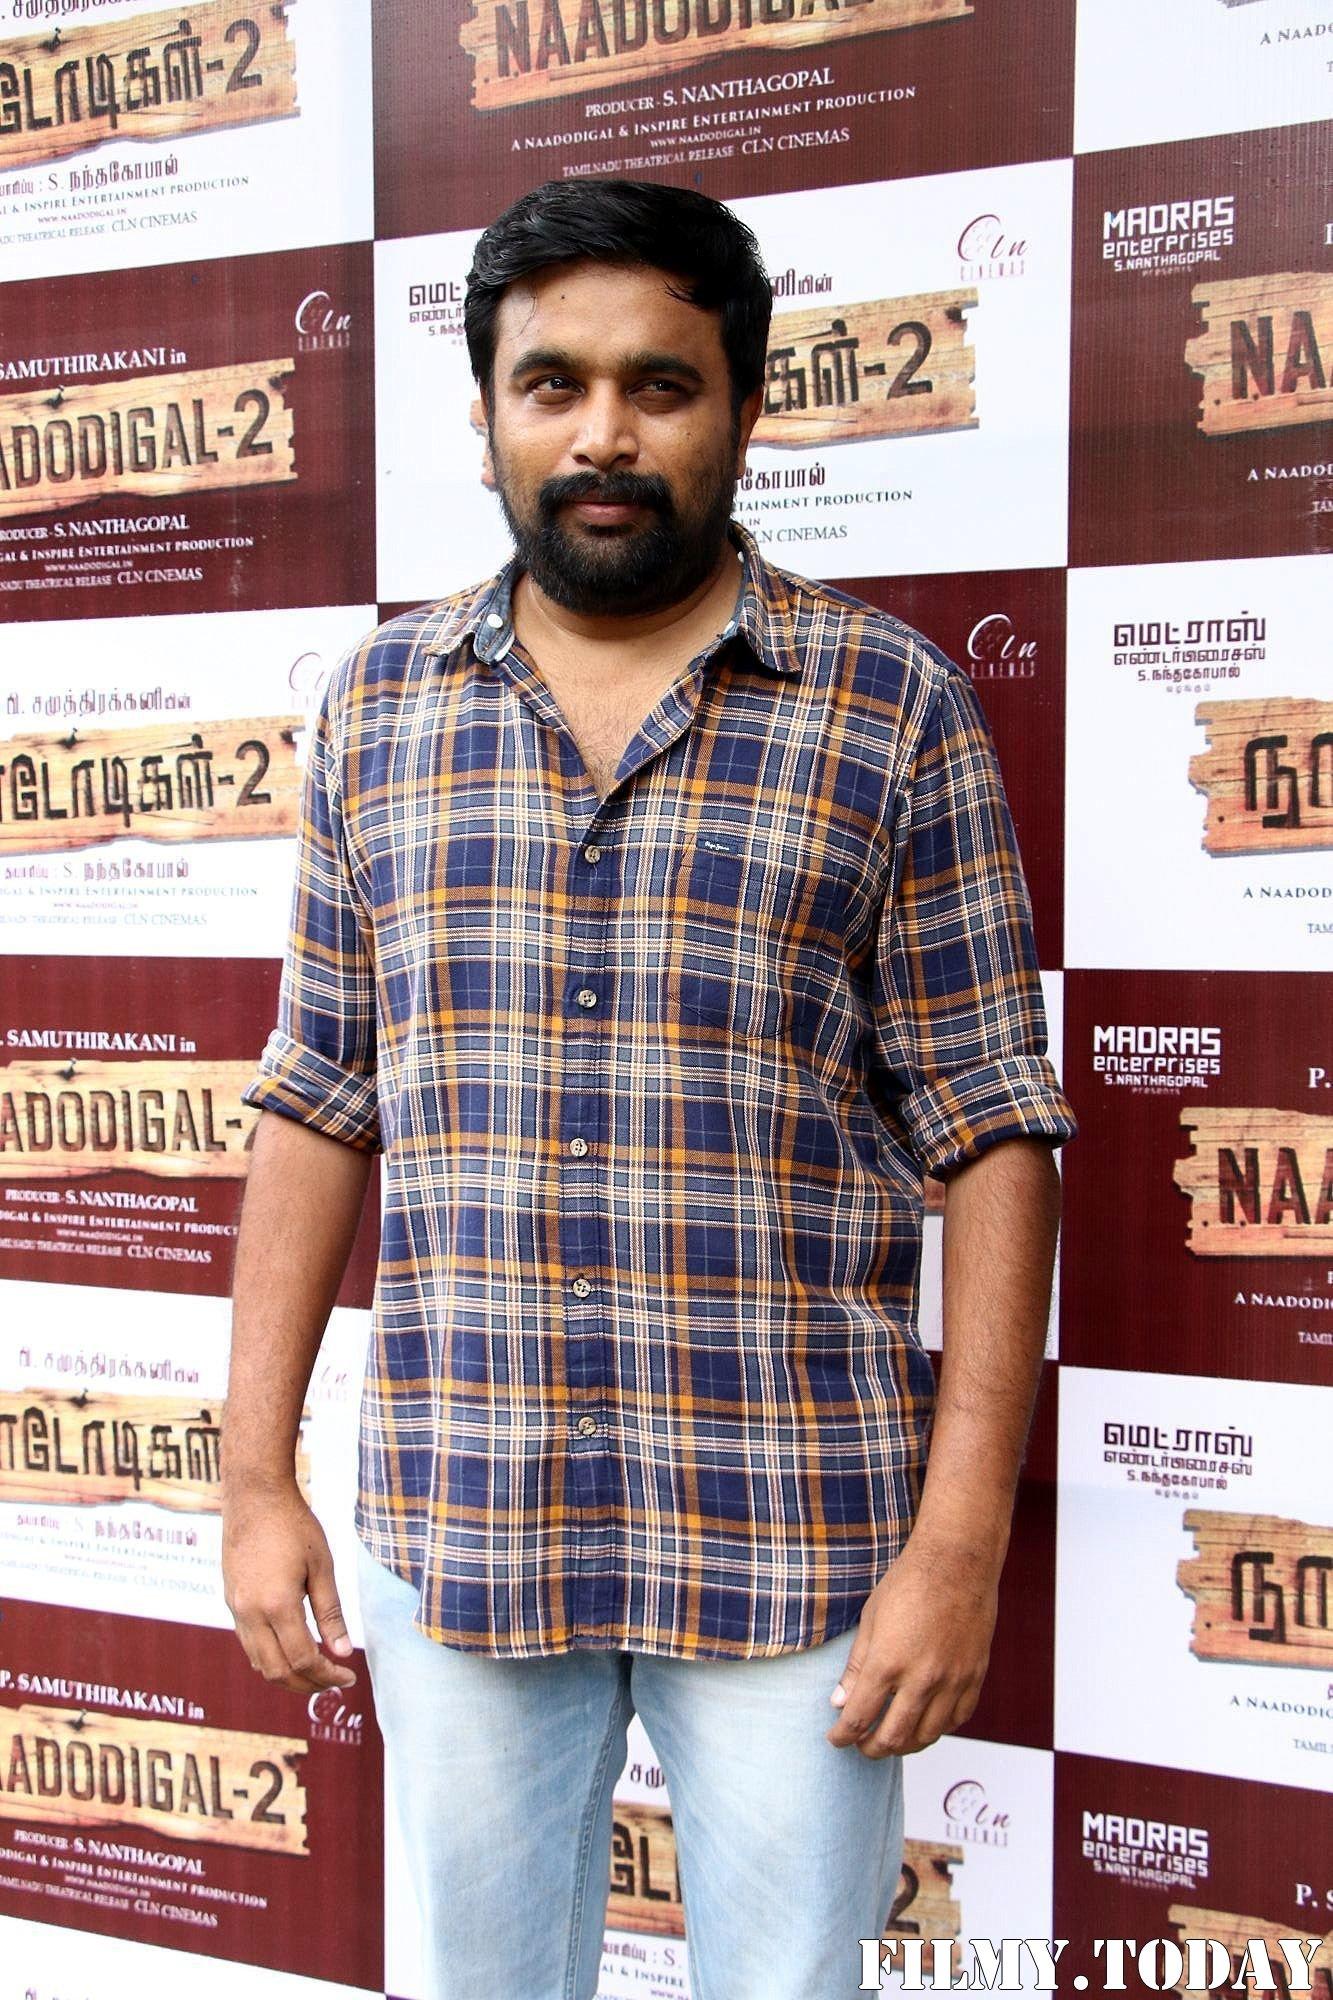 M Sasikumar - Naadodigal 2 Movie Audio Launch Photos | Picture 1683837